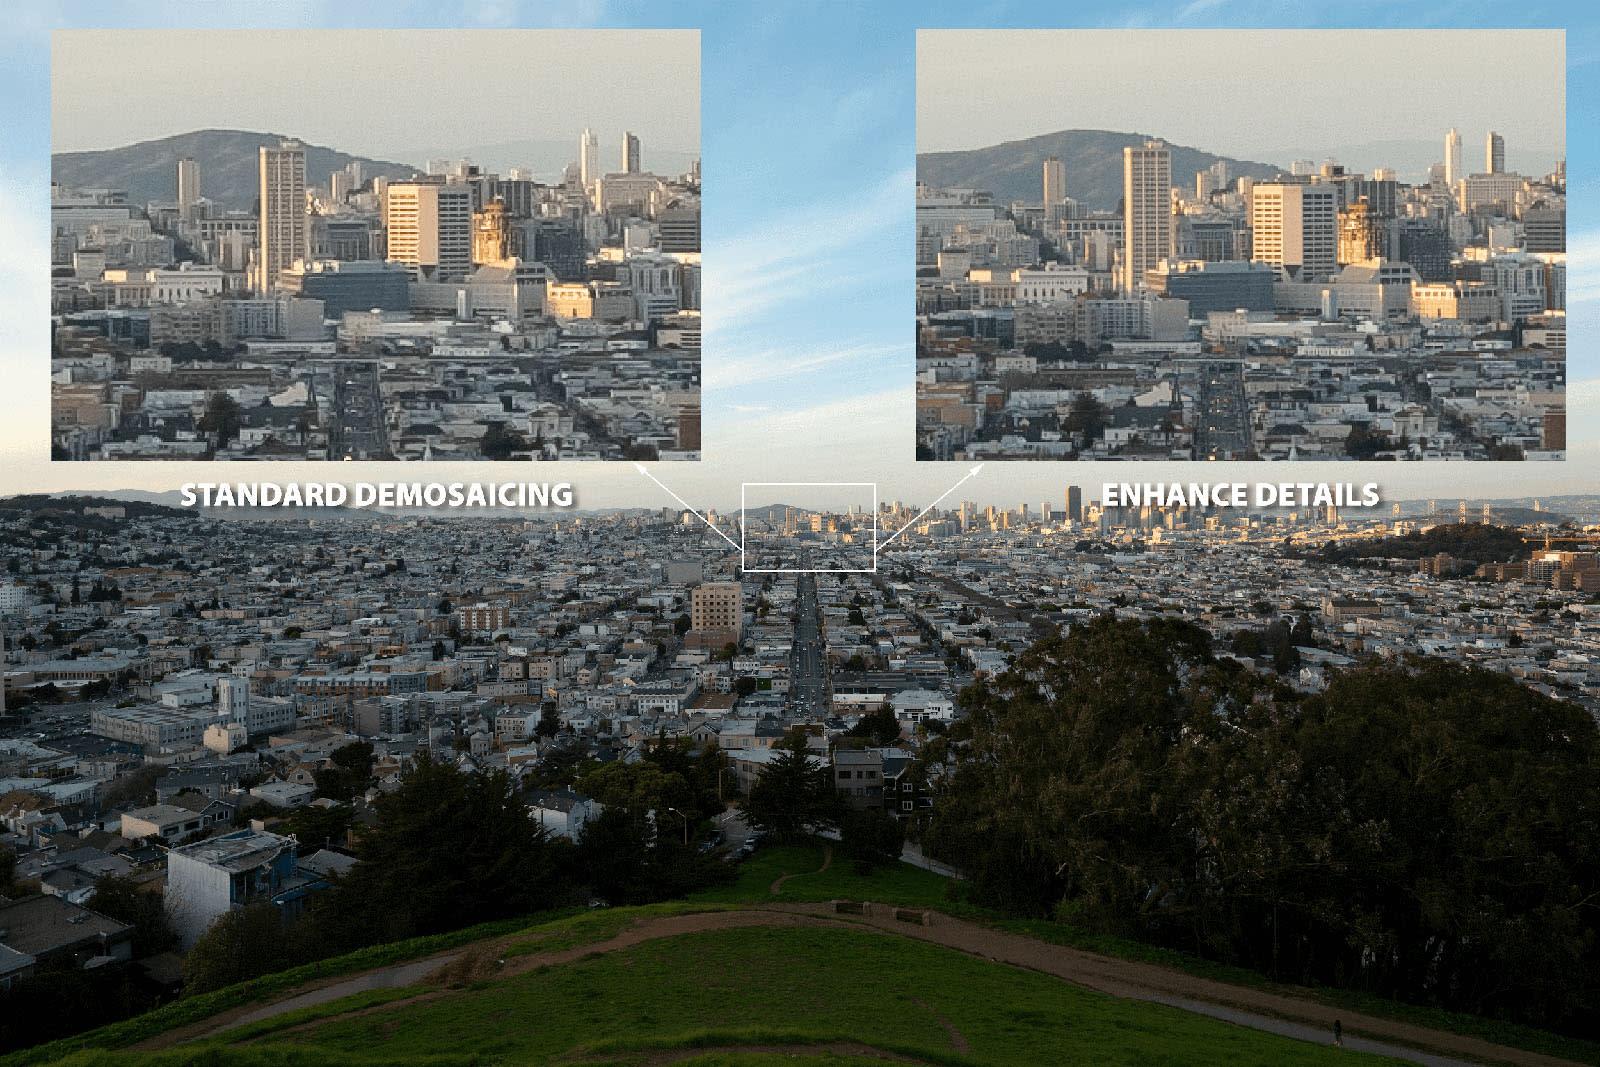 Adobe Lightroom Enhance Details demosaic